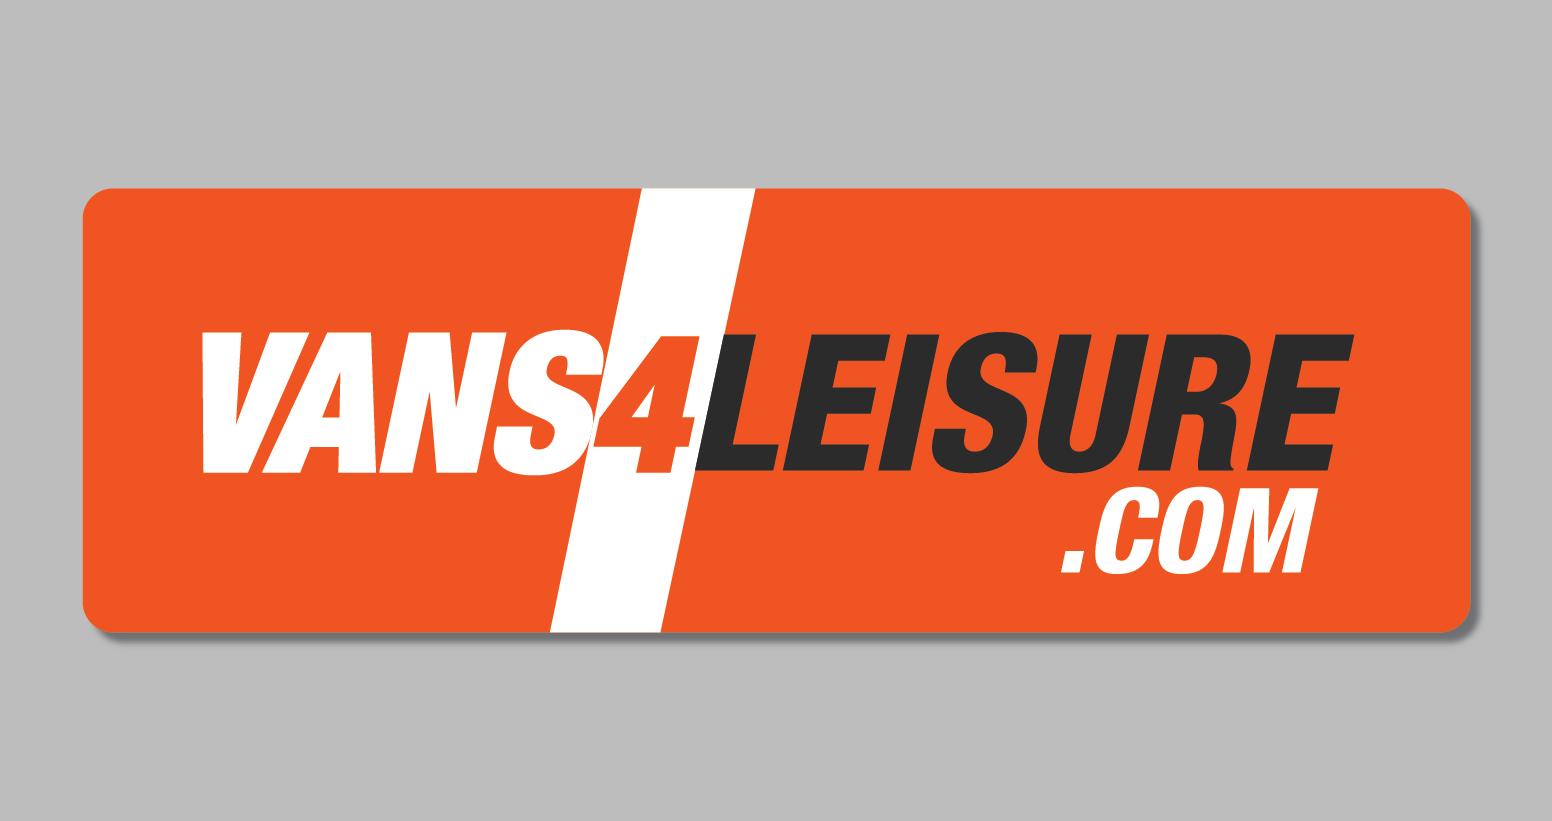 Vans4Leisure Logo